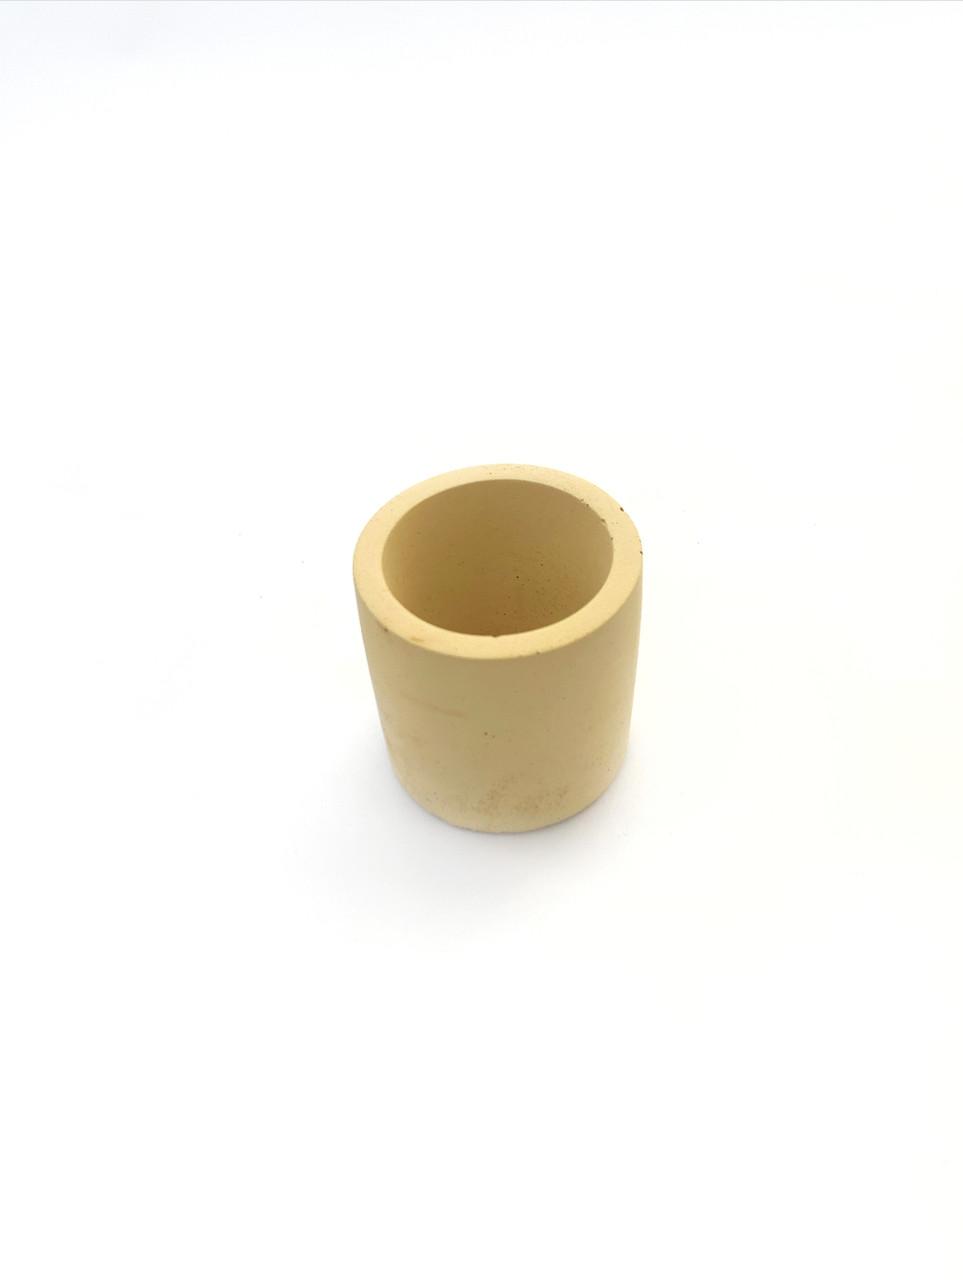 Бетонний горщик Decoline v-70 мл.  (желтый) B1003-6